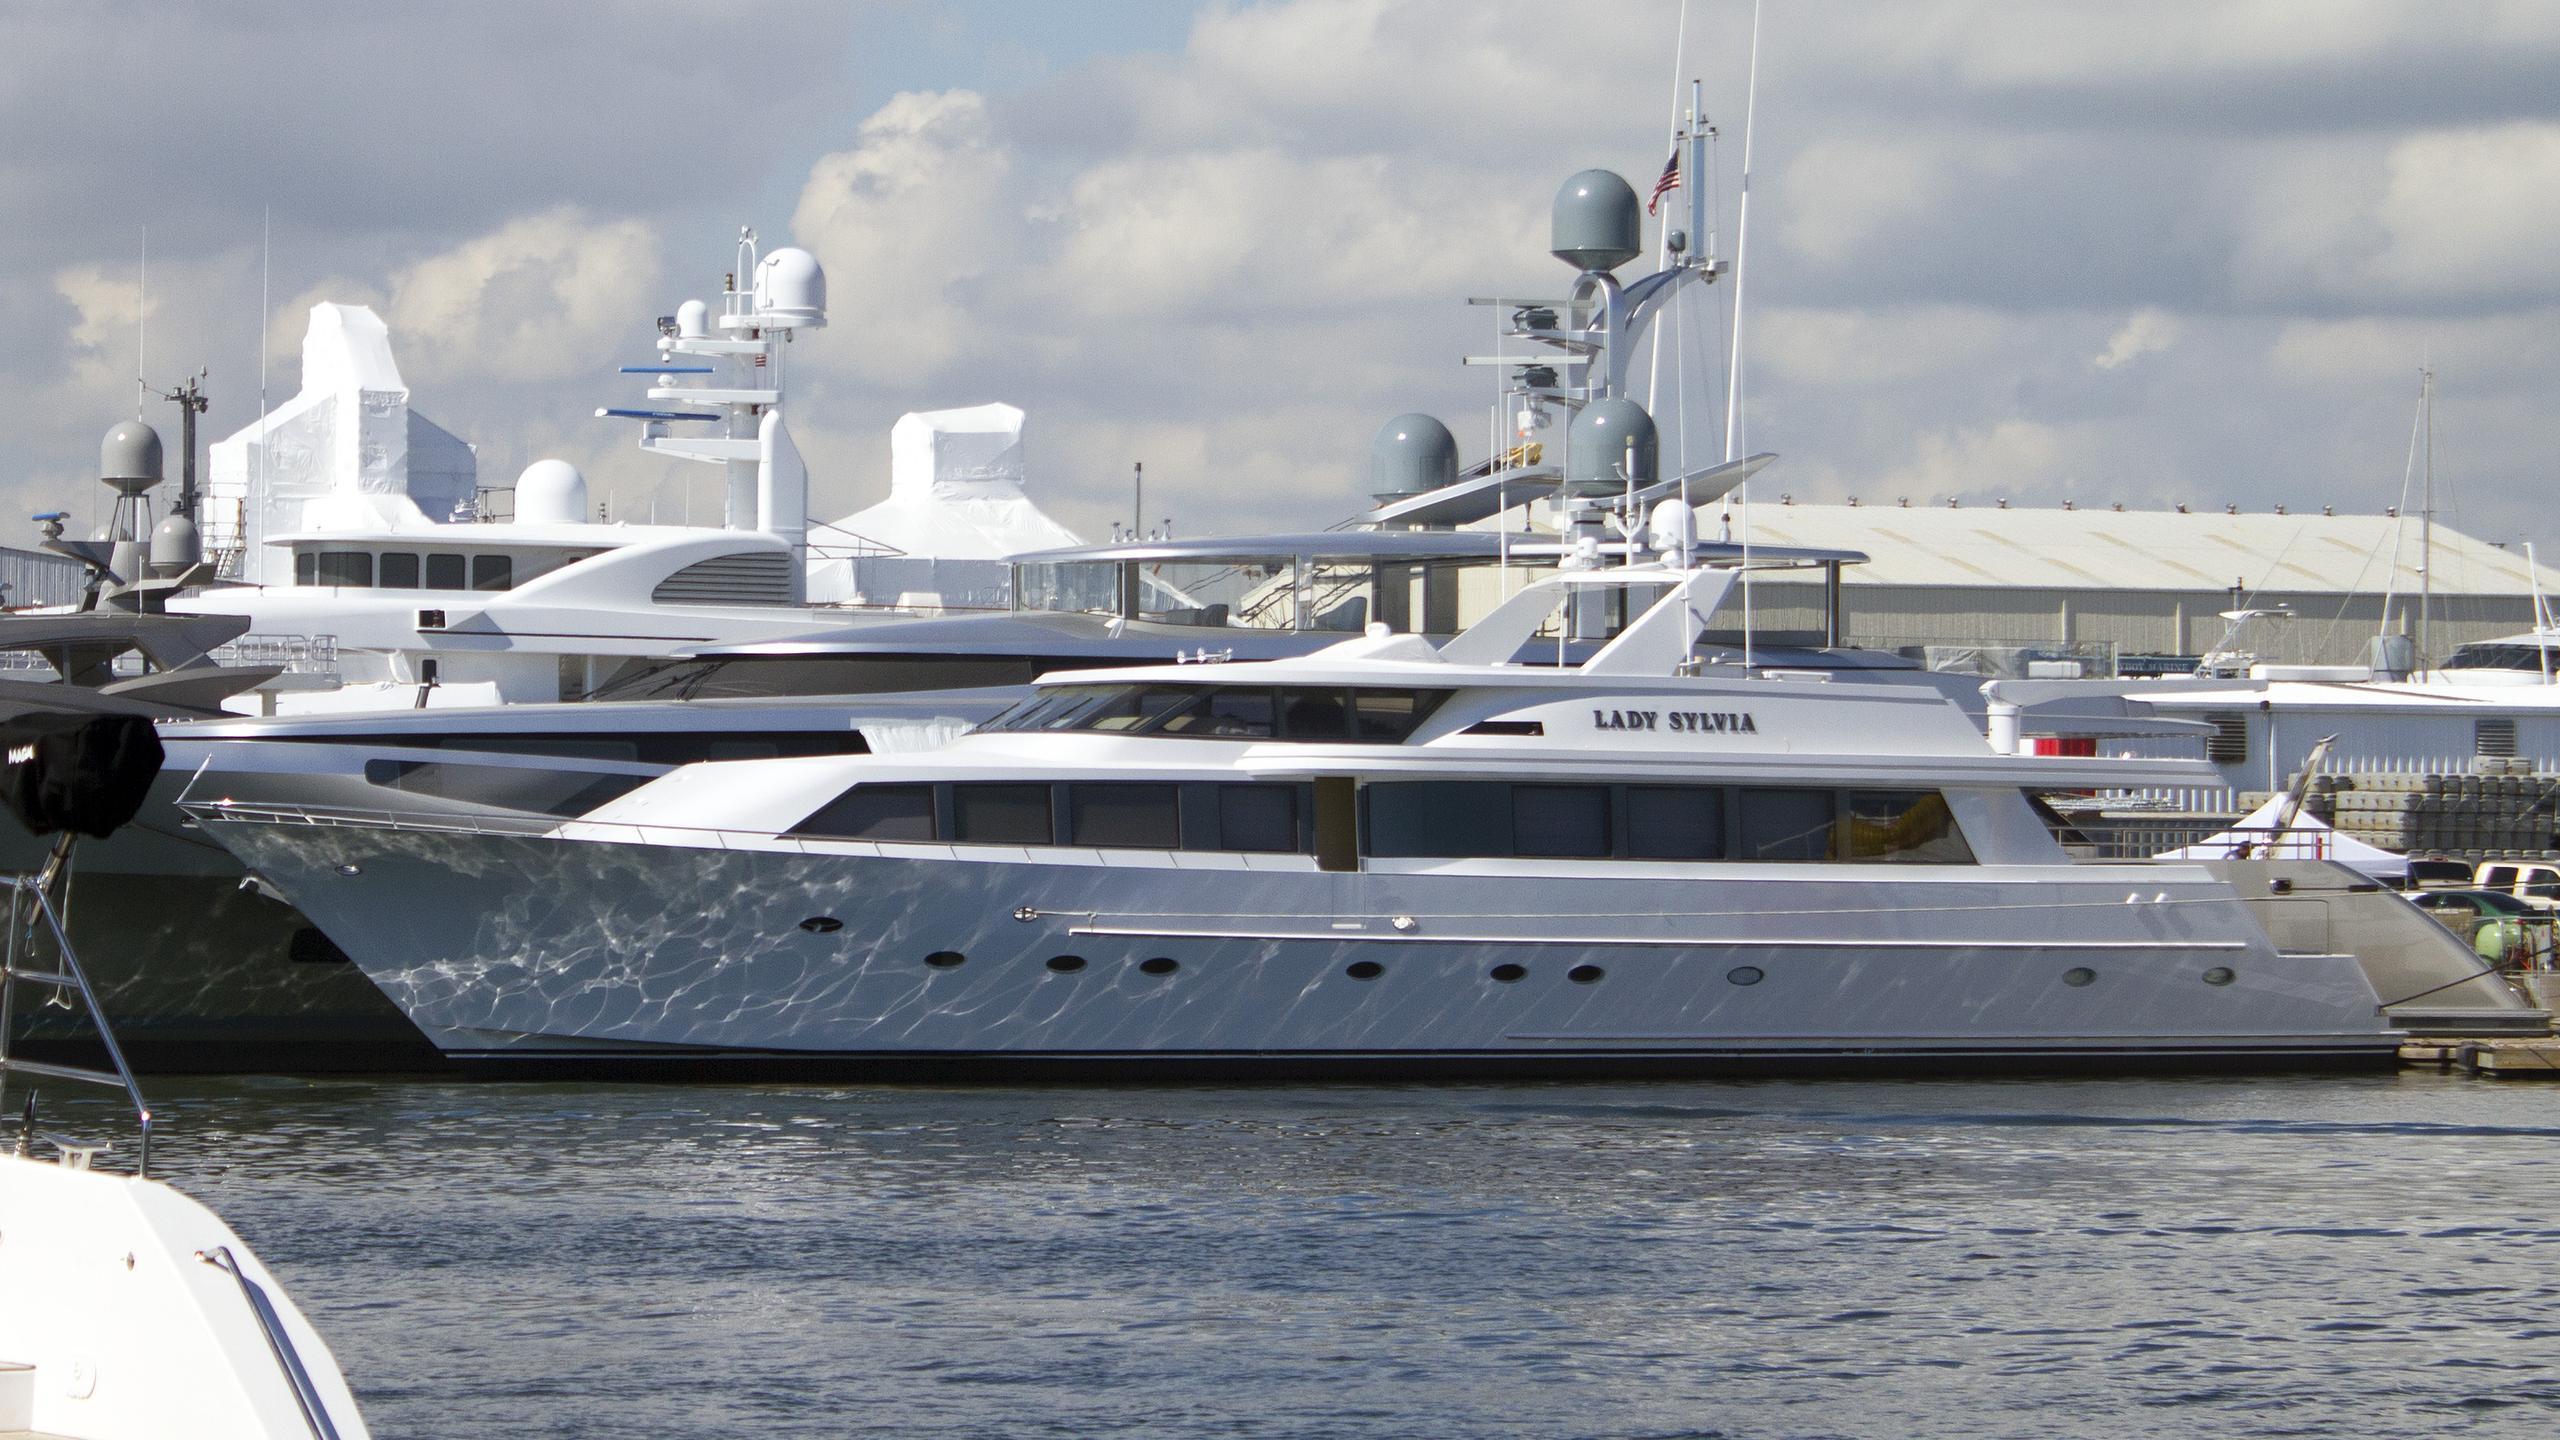 westport-westship-lady-sylvia-1996-motor-yacht-profile